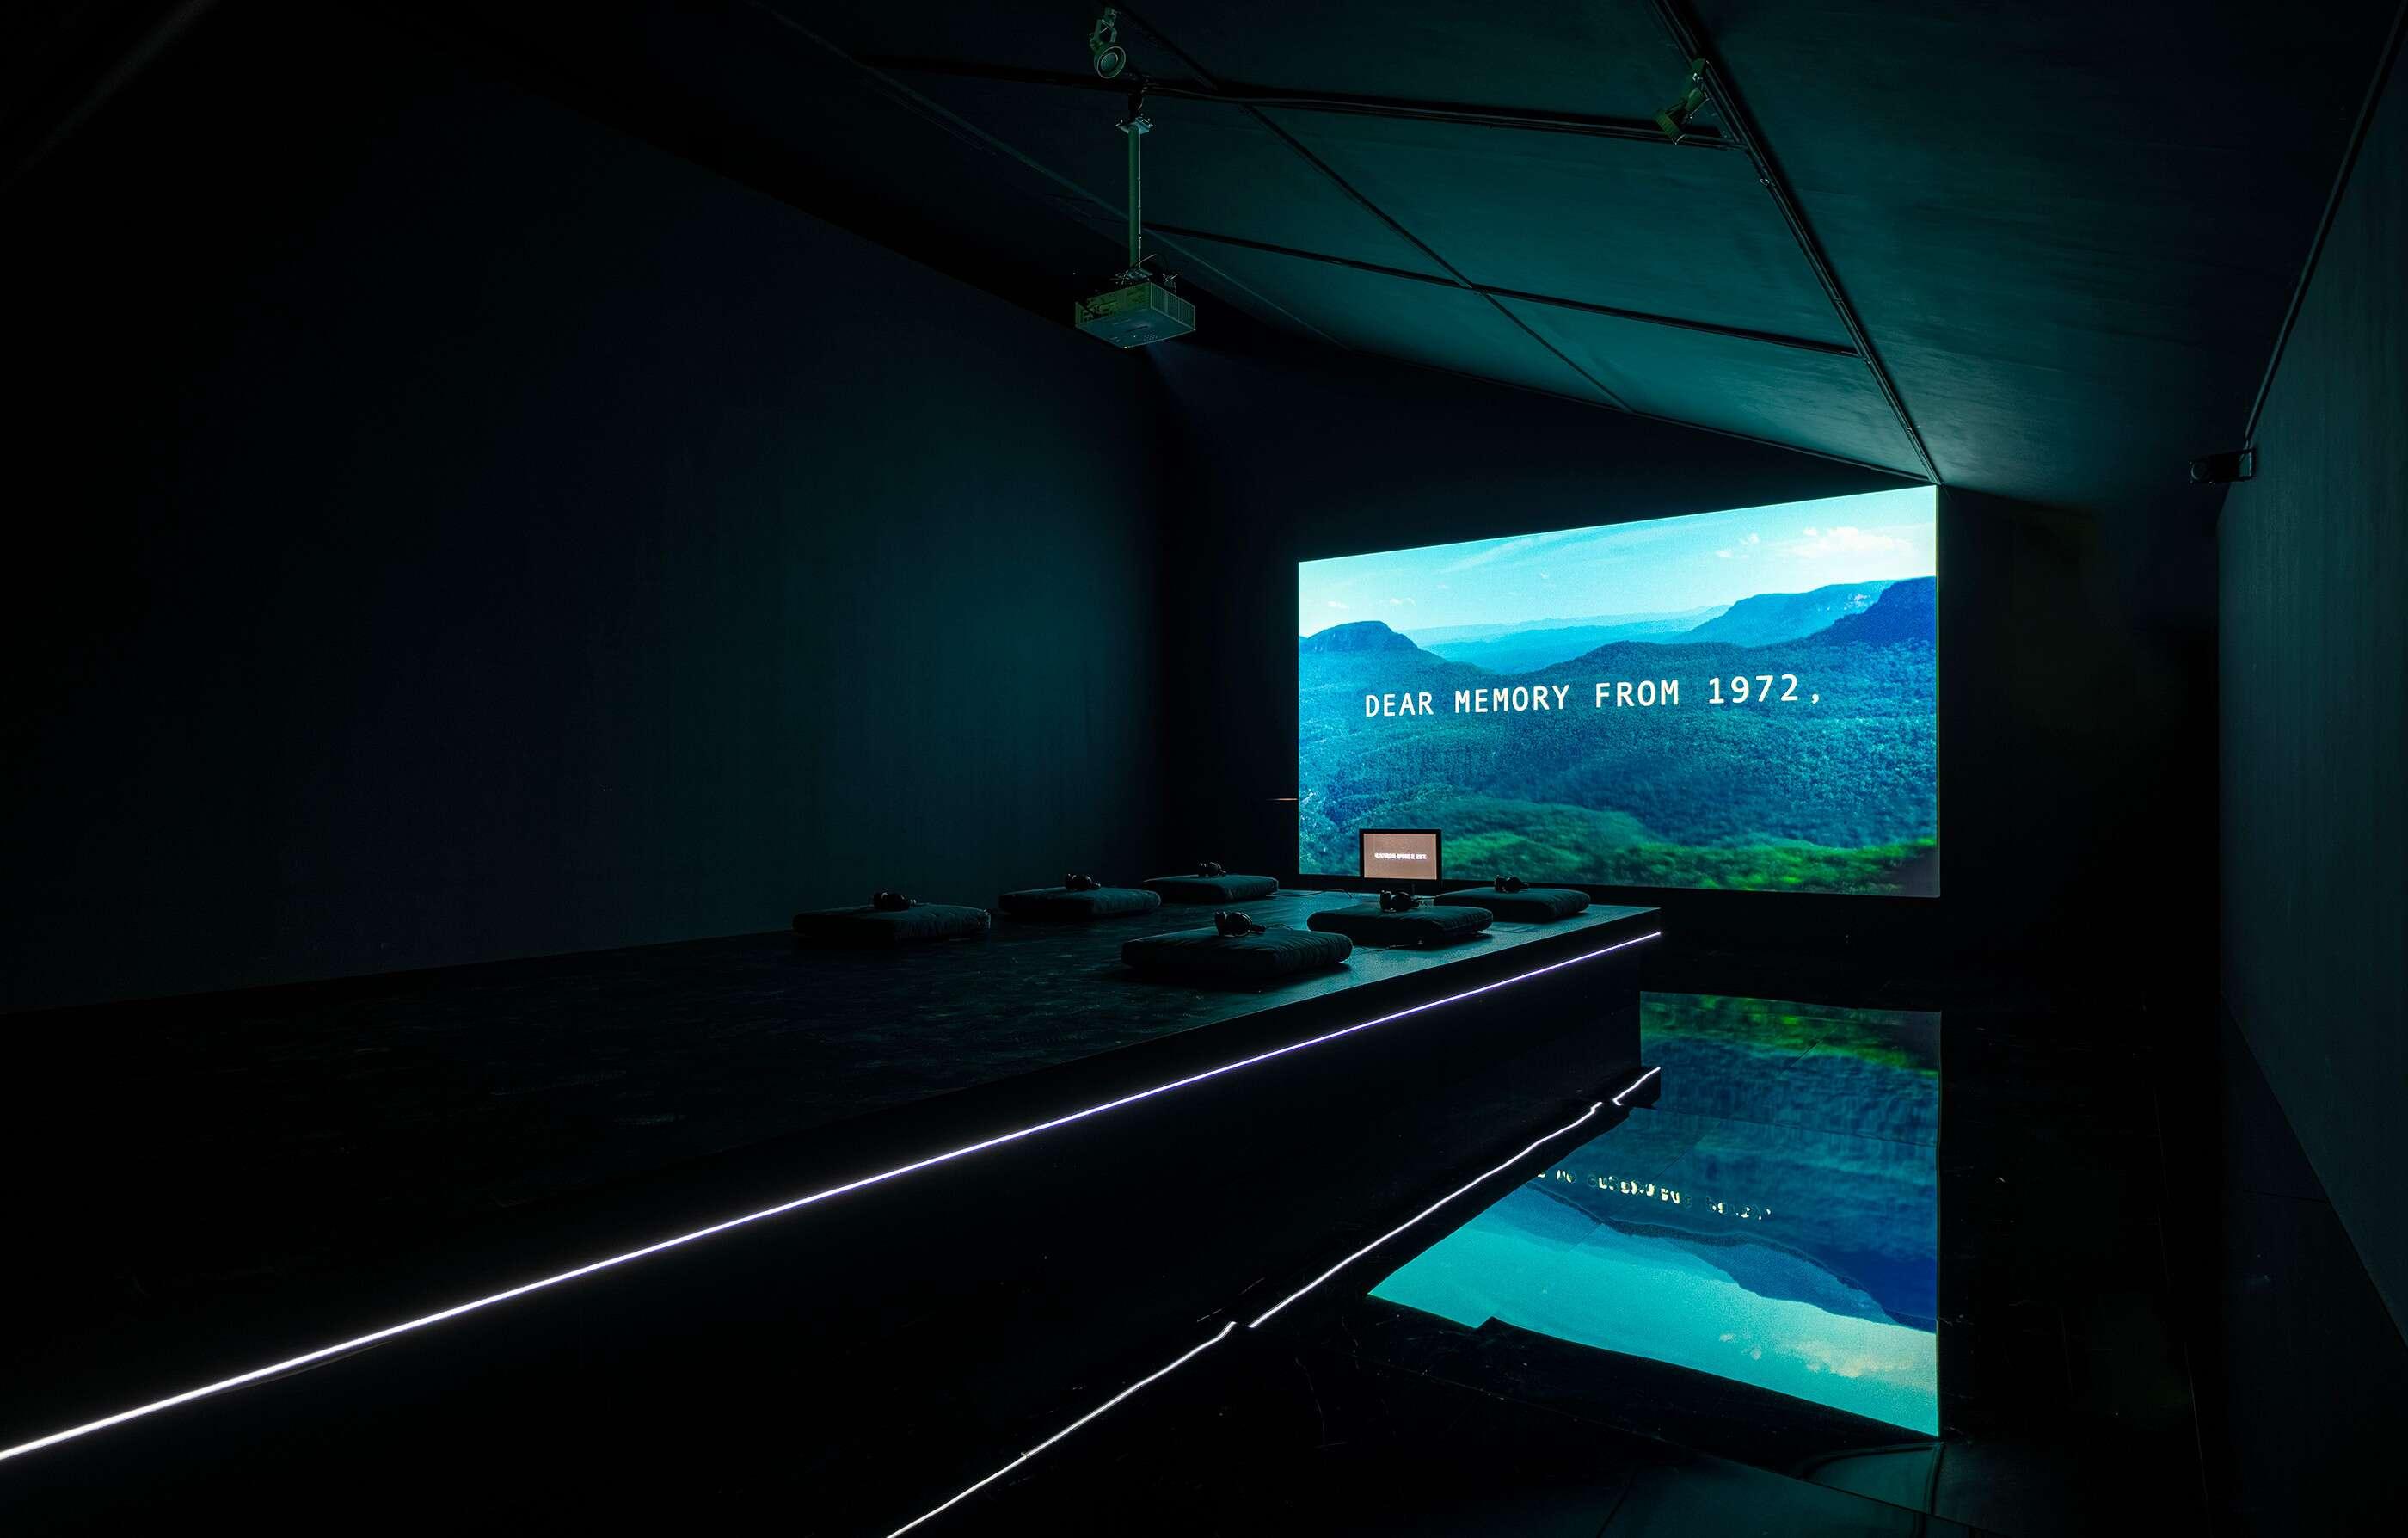 Cécile-B-Evans-What-the-Heart-Wants-2016-Exhibition-No-Space-Just-a-Place-Daelim-Museum-Seoul-2020